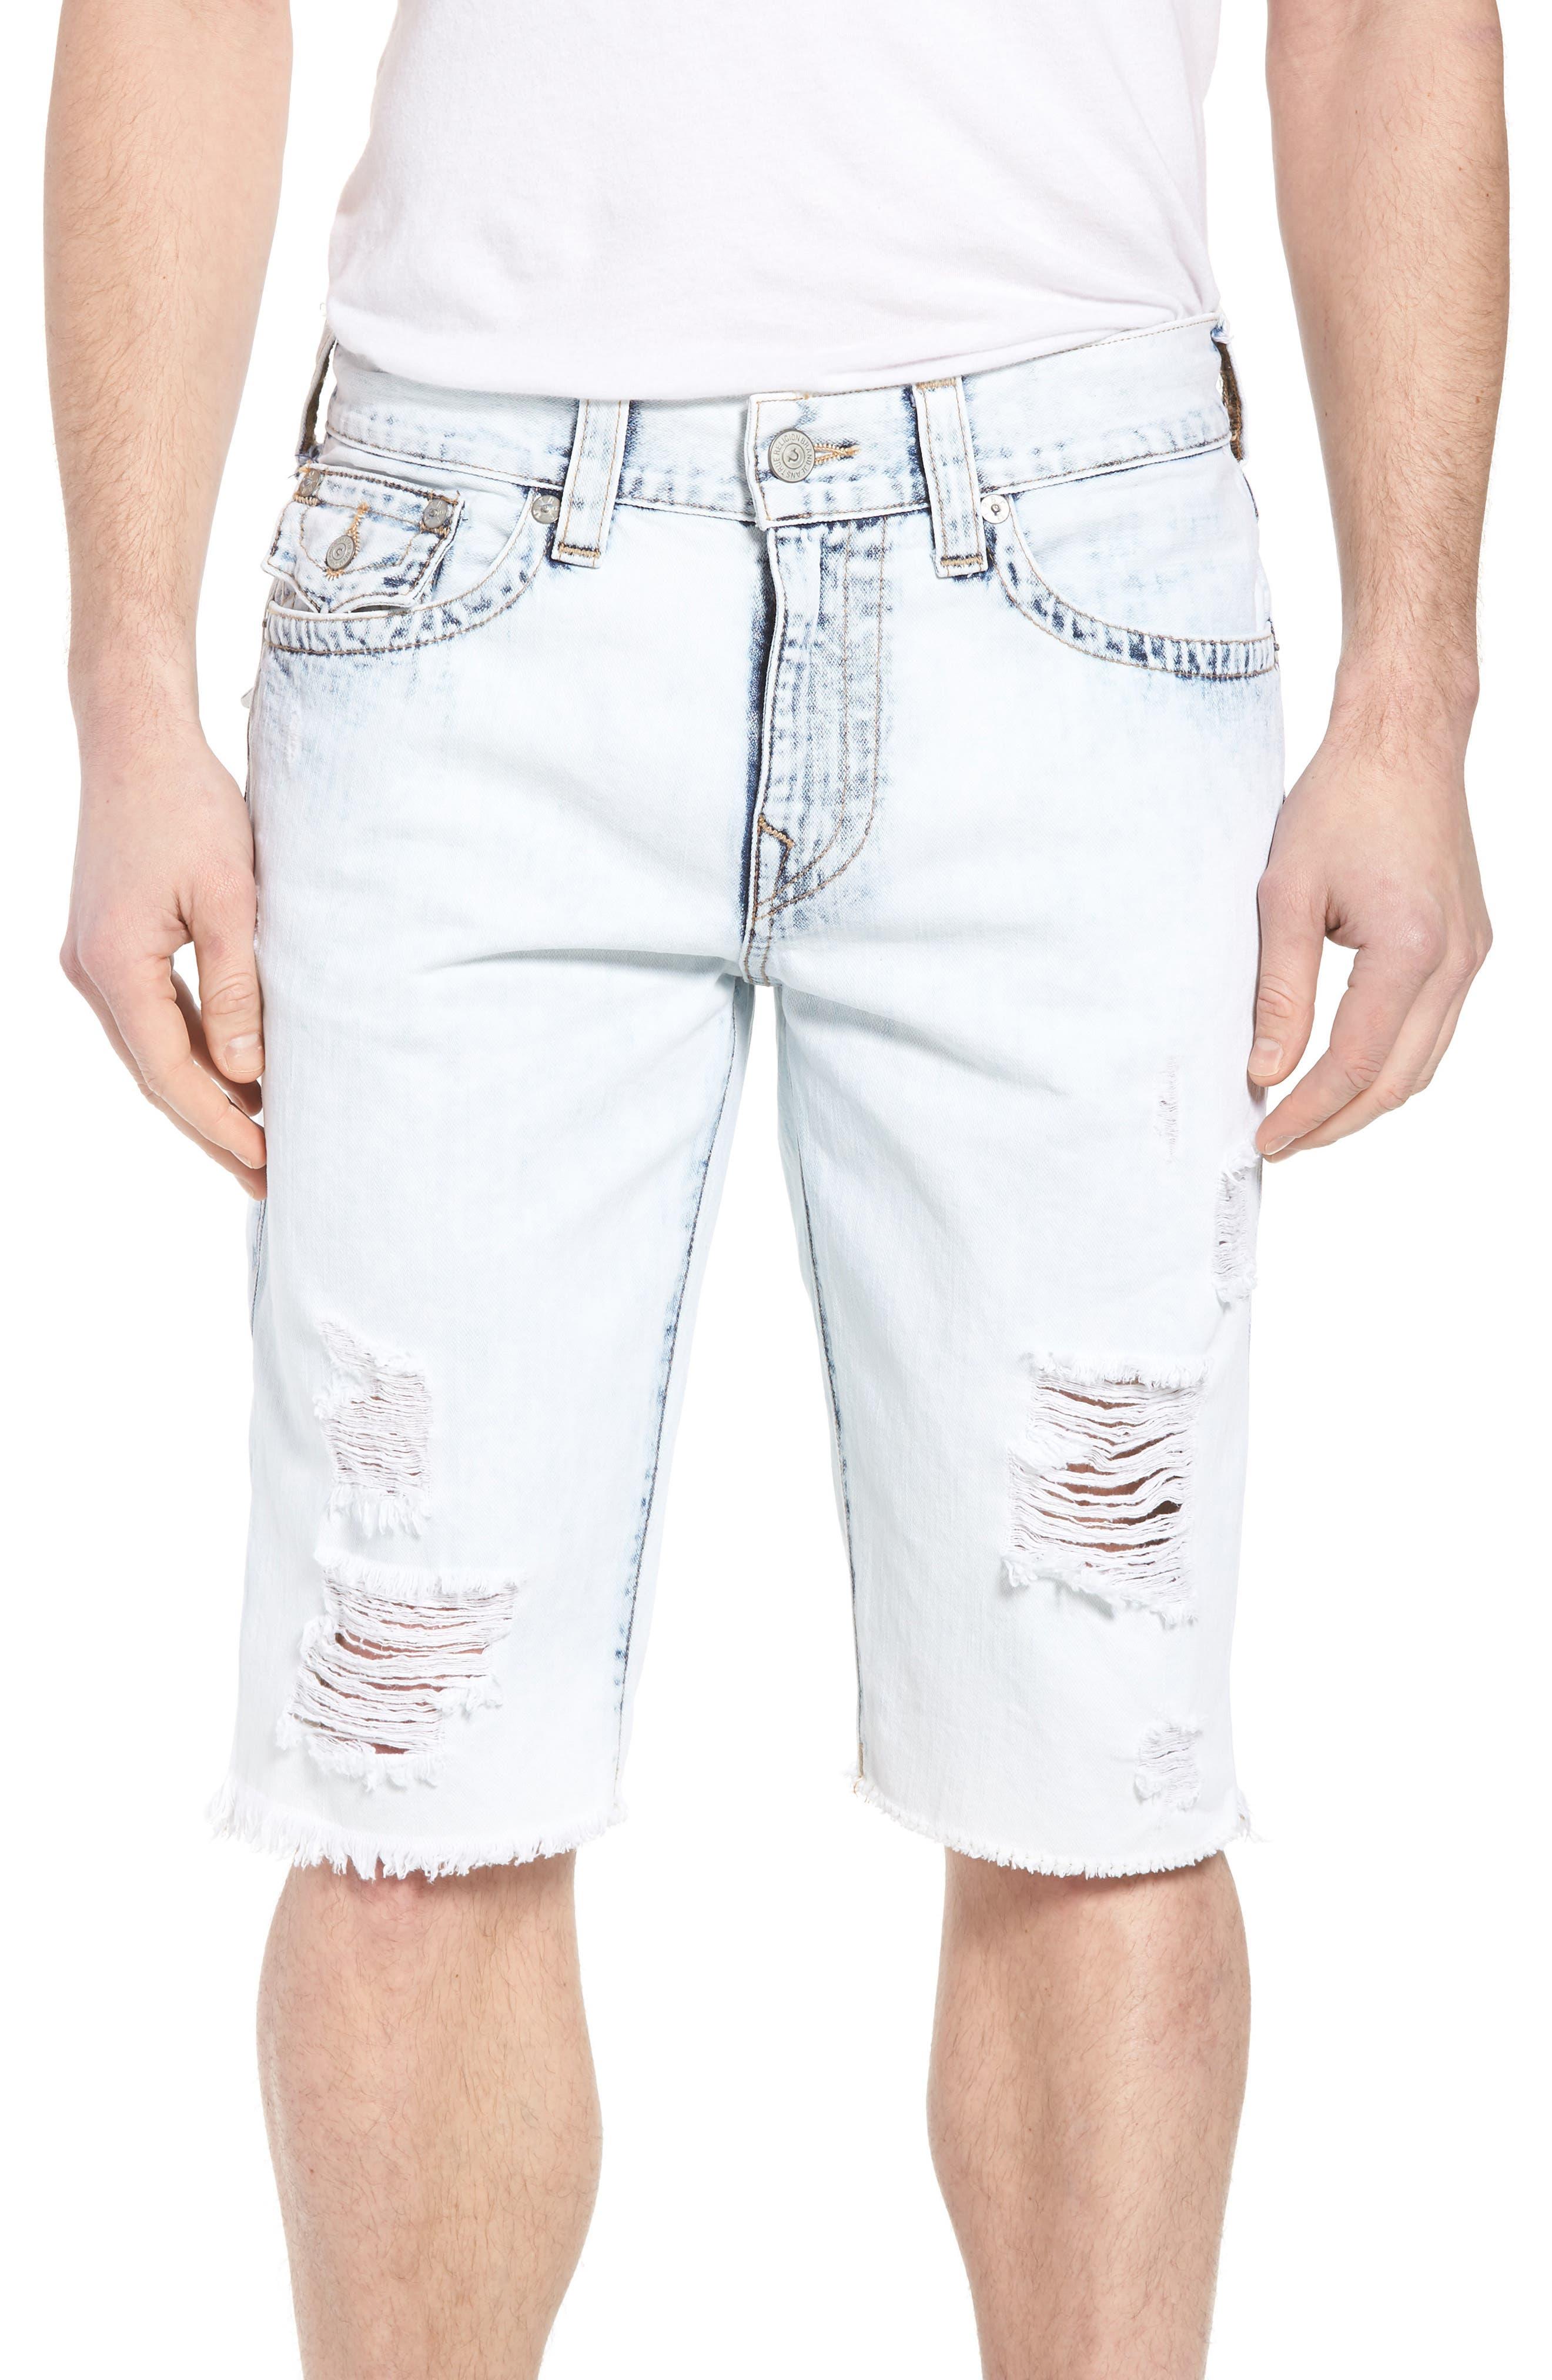 Geno Denim Shorts,                         Main,                         color, EPDL WORN CLOUDFALL